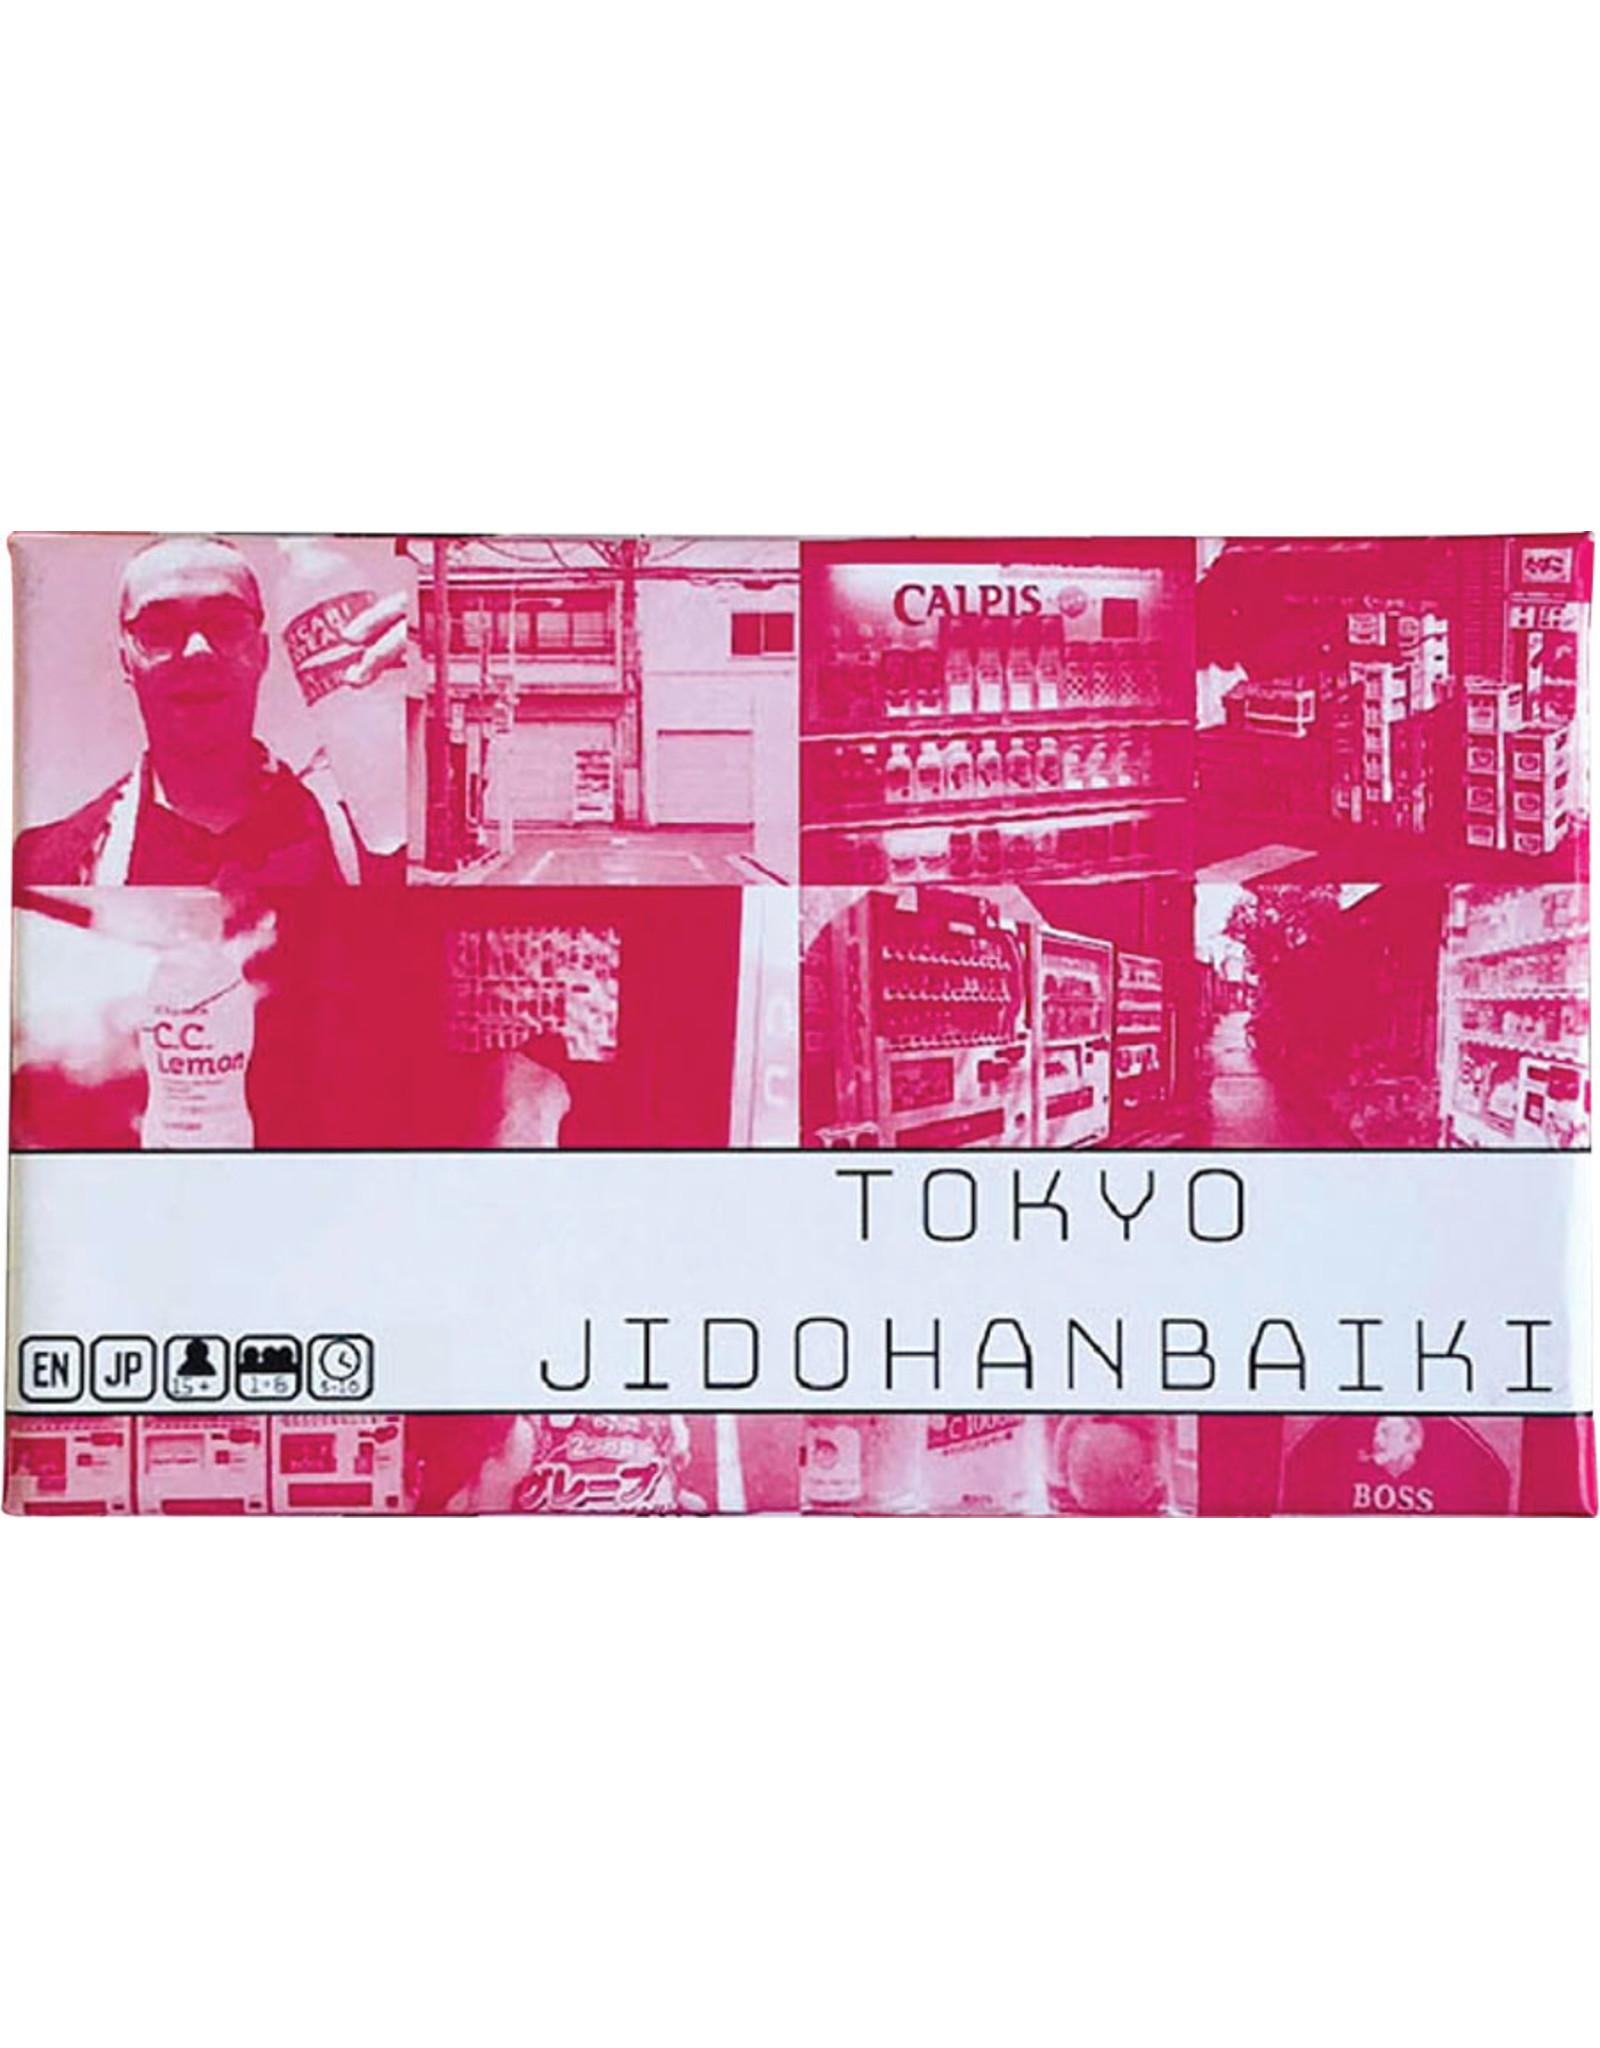 Jordan Draper Games Tokyo Jidohanbaiki